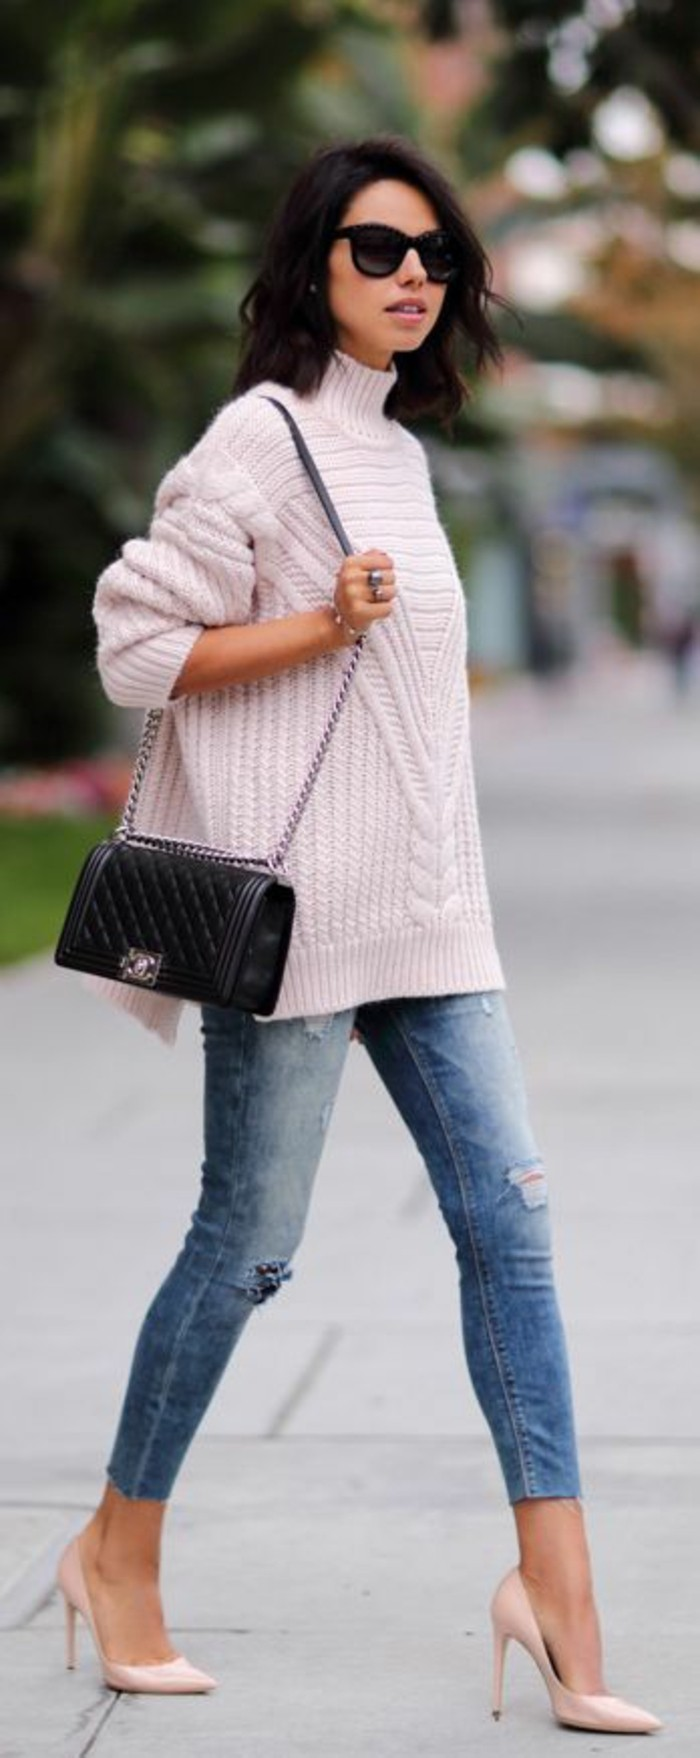 jolie-tenue-jean-slim-et-pull-oversize-a-col-montant